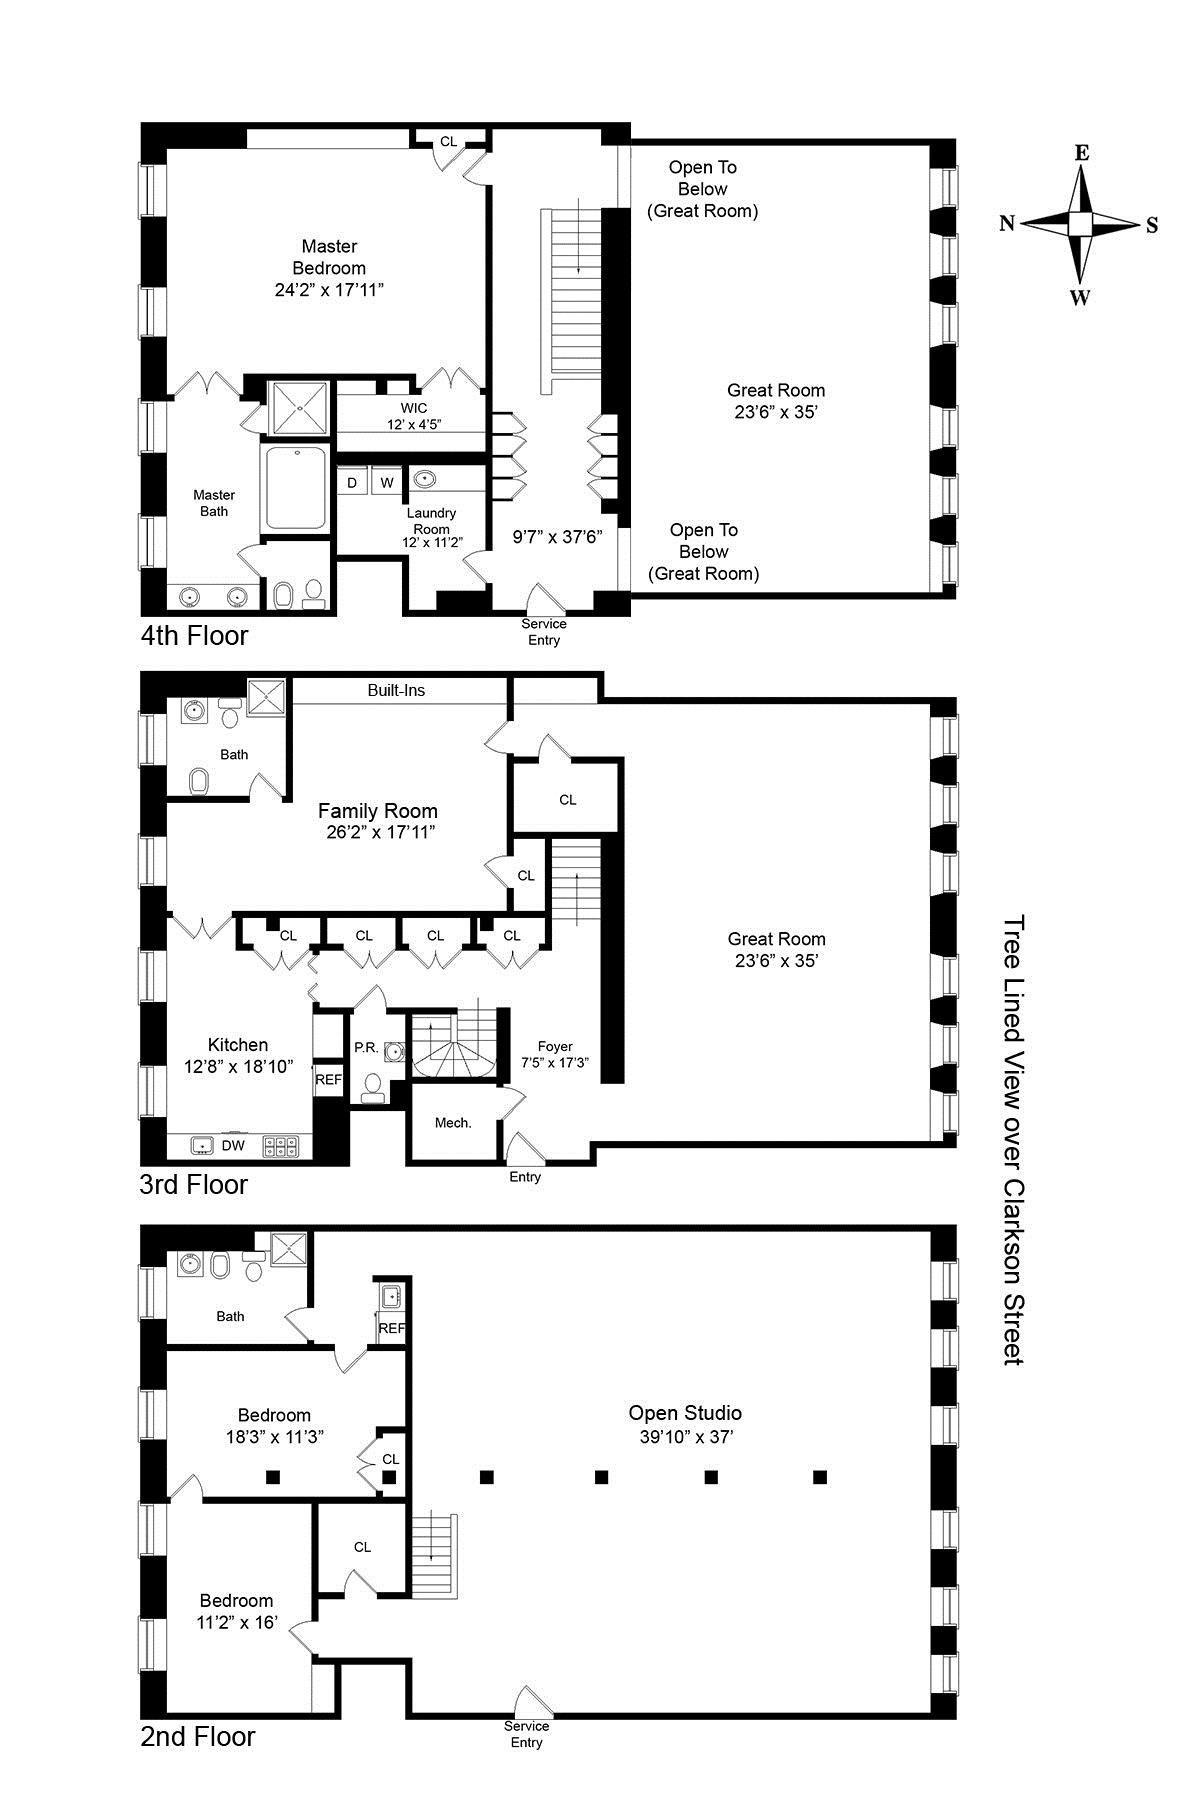 Gallant Ny Plan My Apartment Luxury New York Apartment Plan Two Luxury Apartments Apartment Complex Plan apartment Floor Plan Of An Apartment